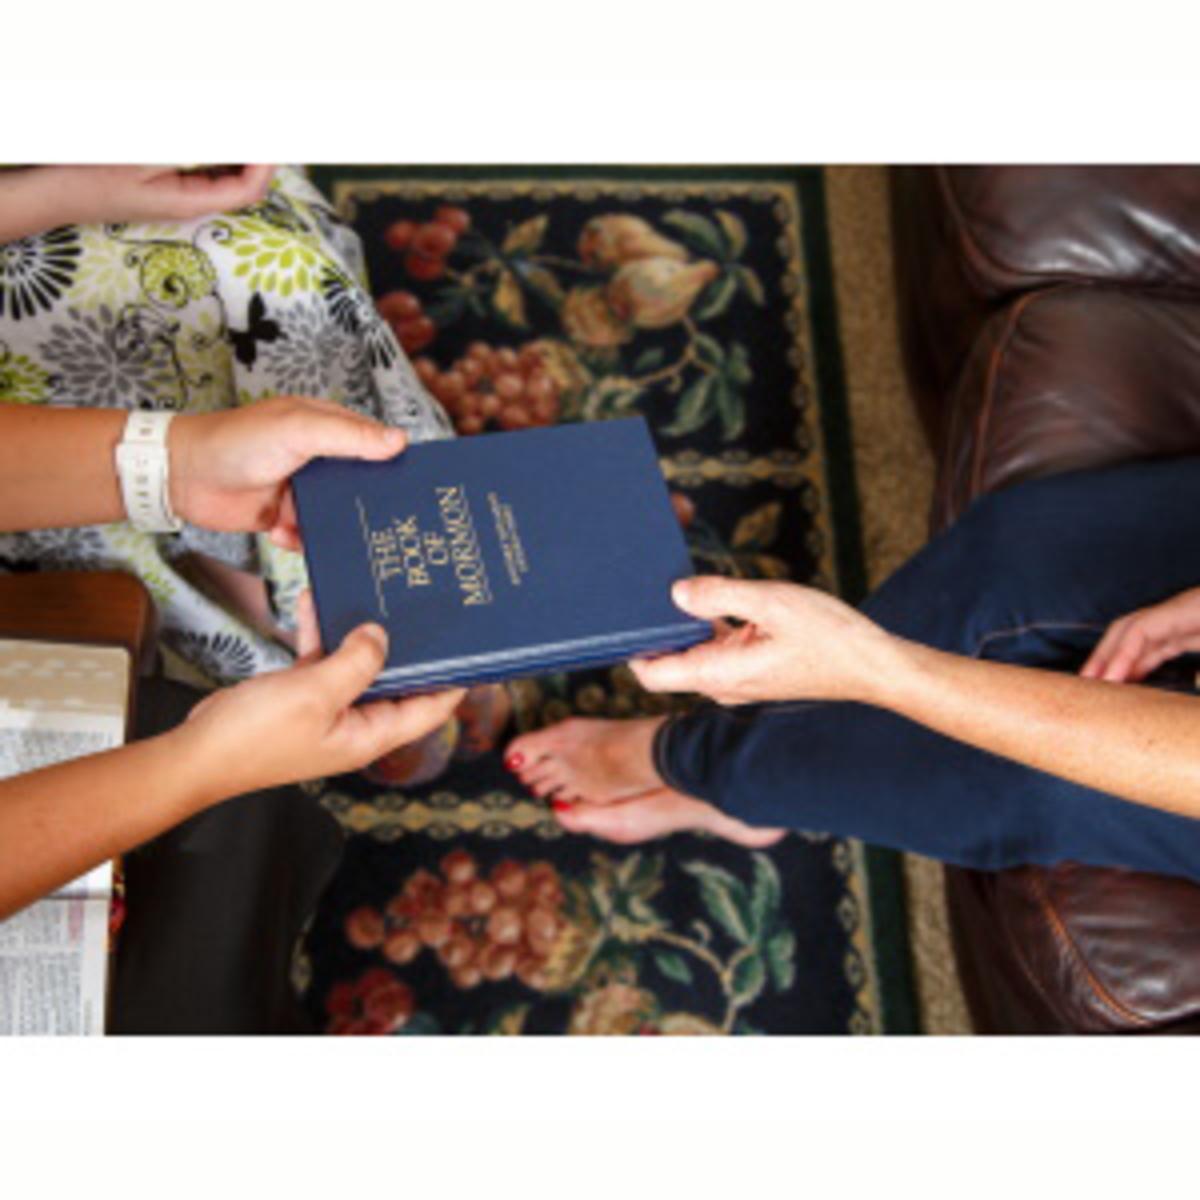 Sharing Book of Mormon